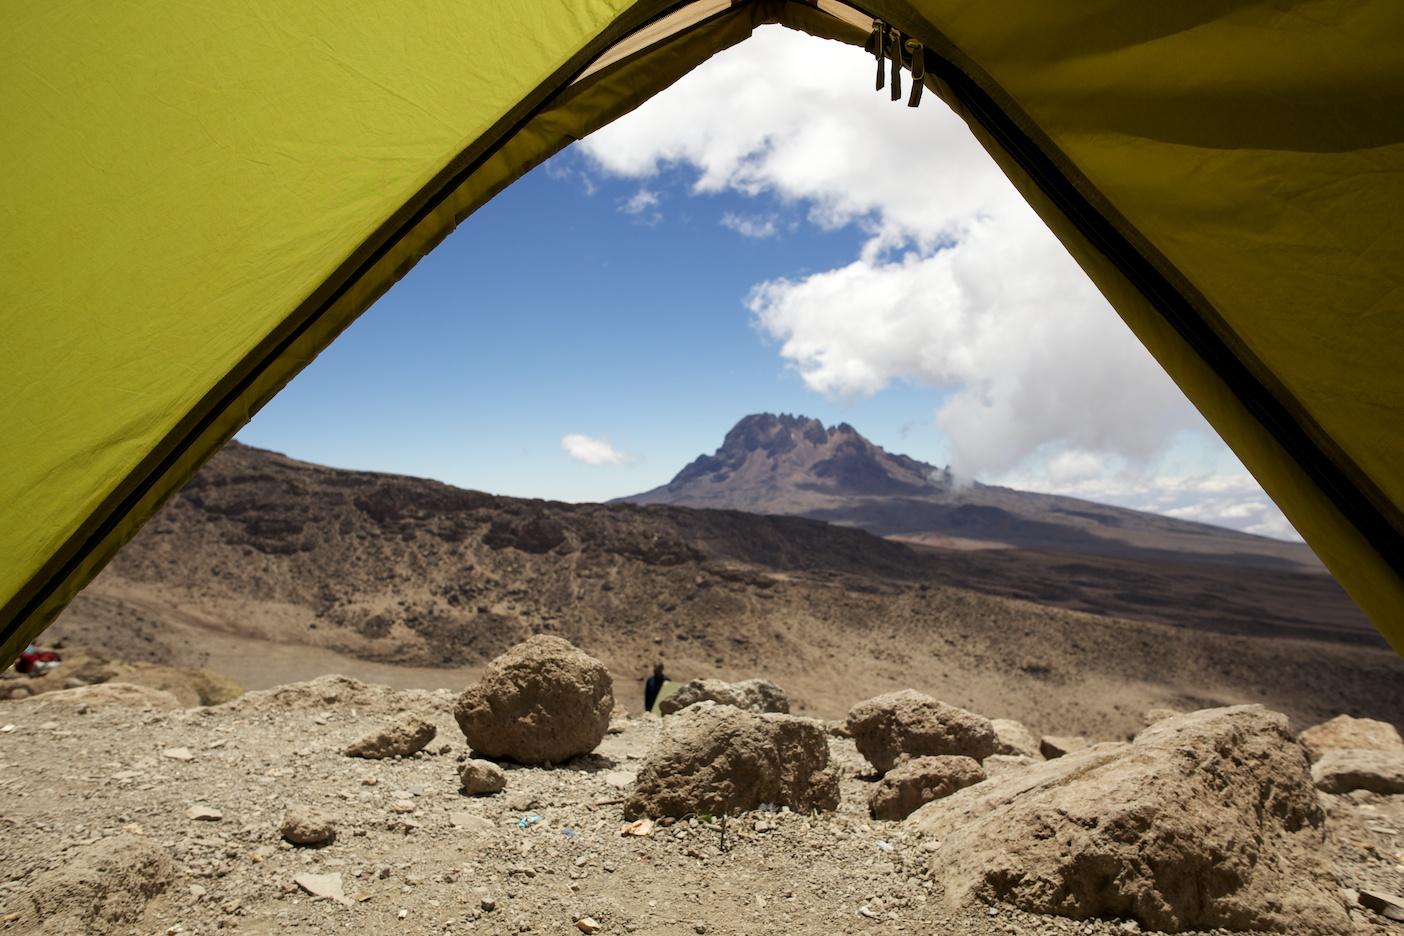 Barafu Camp (4600masl), Kilimanjaro (TZ)